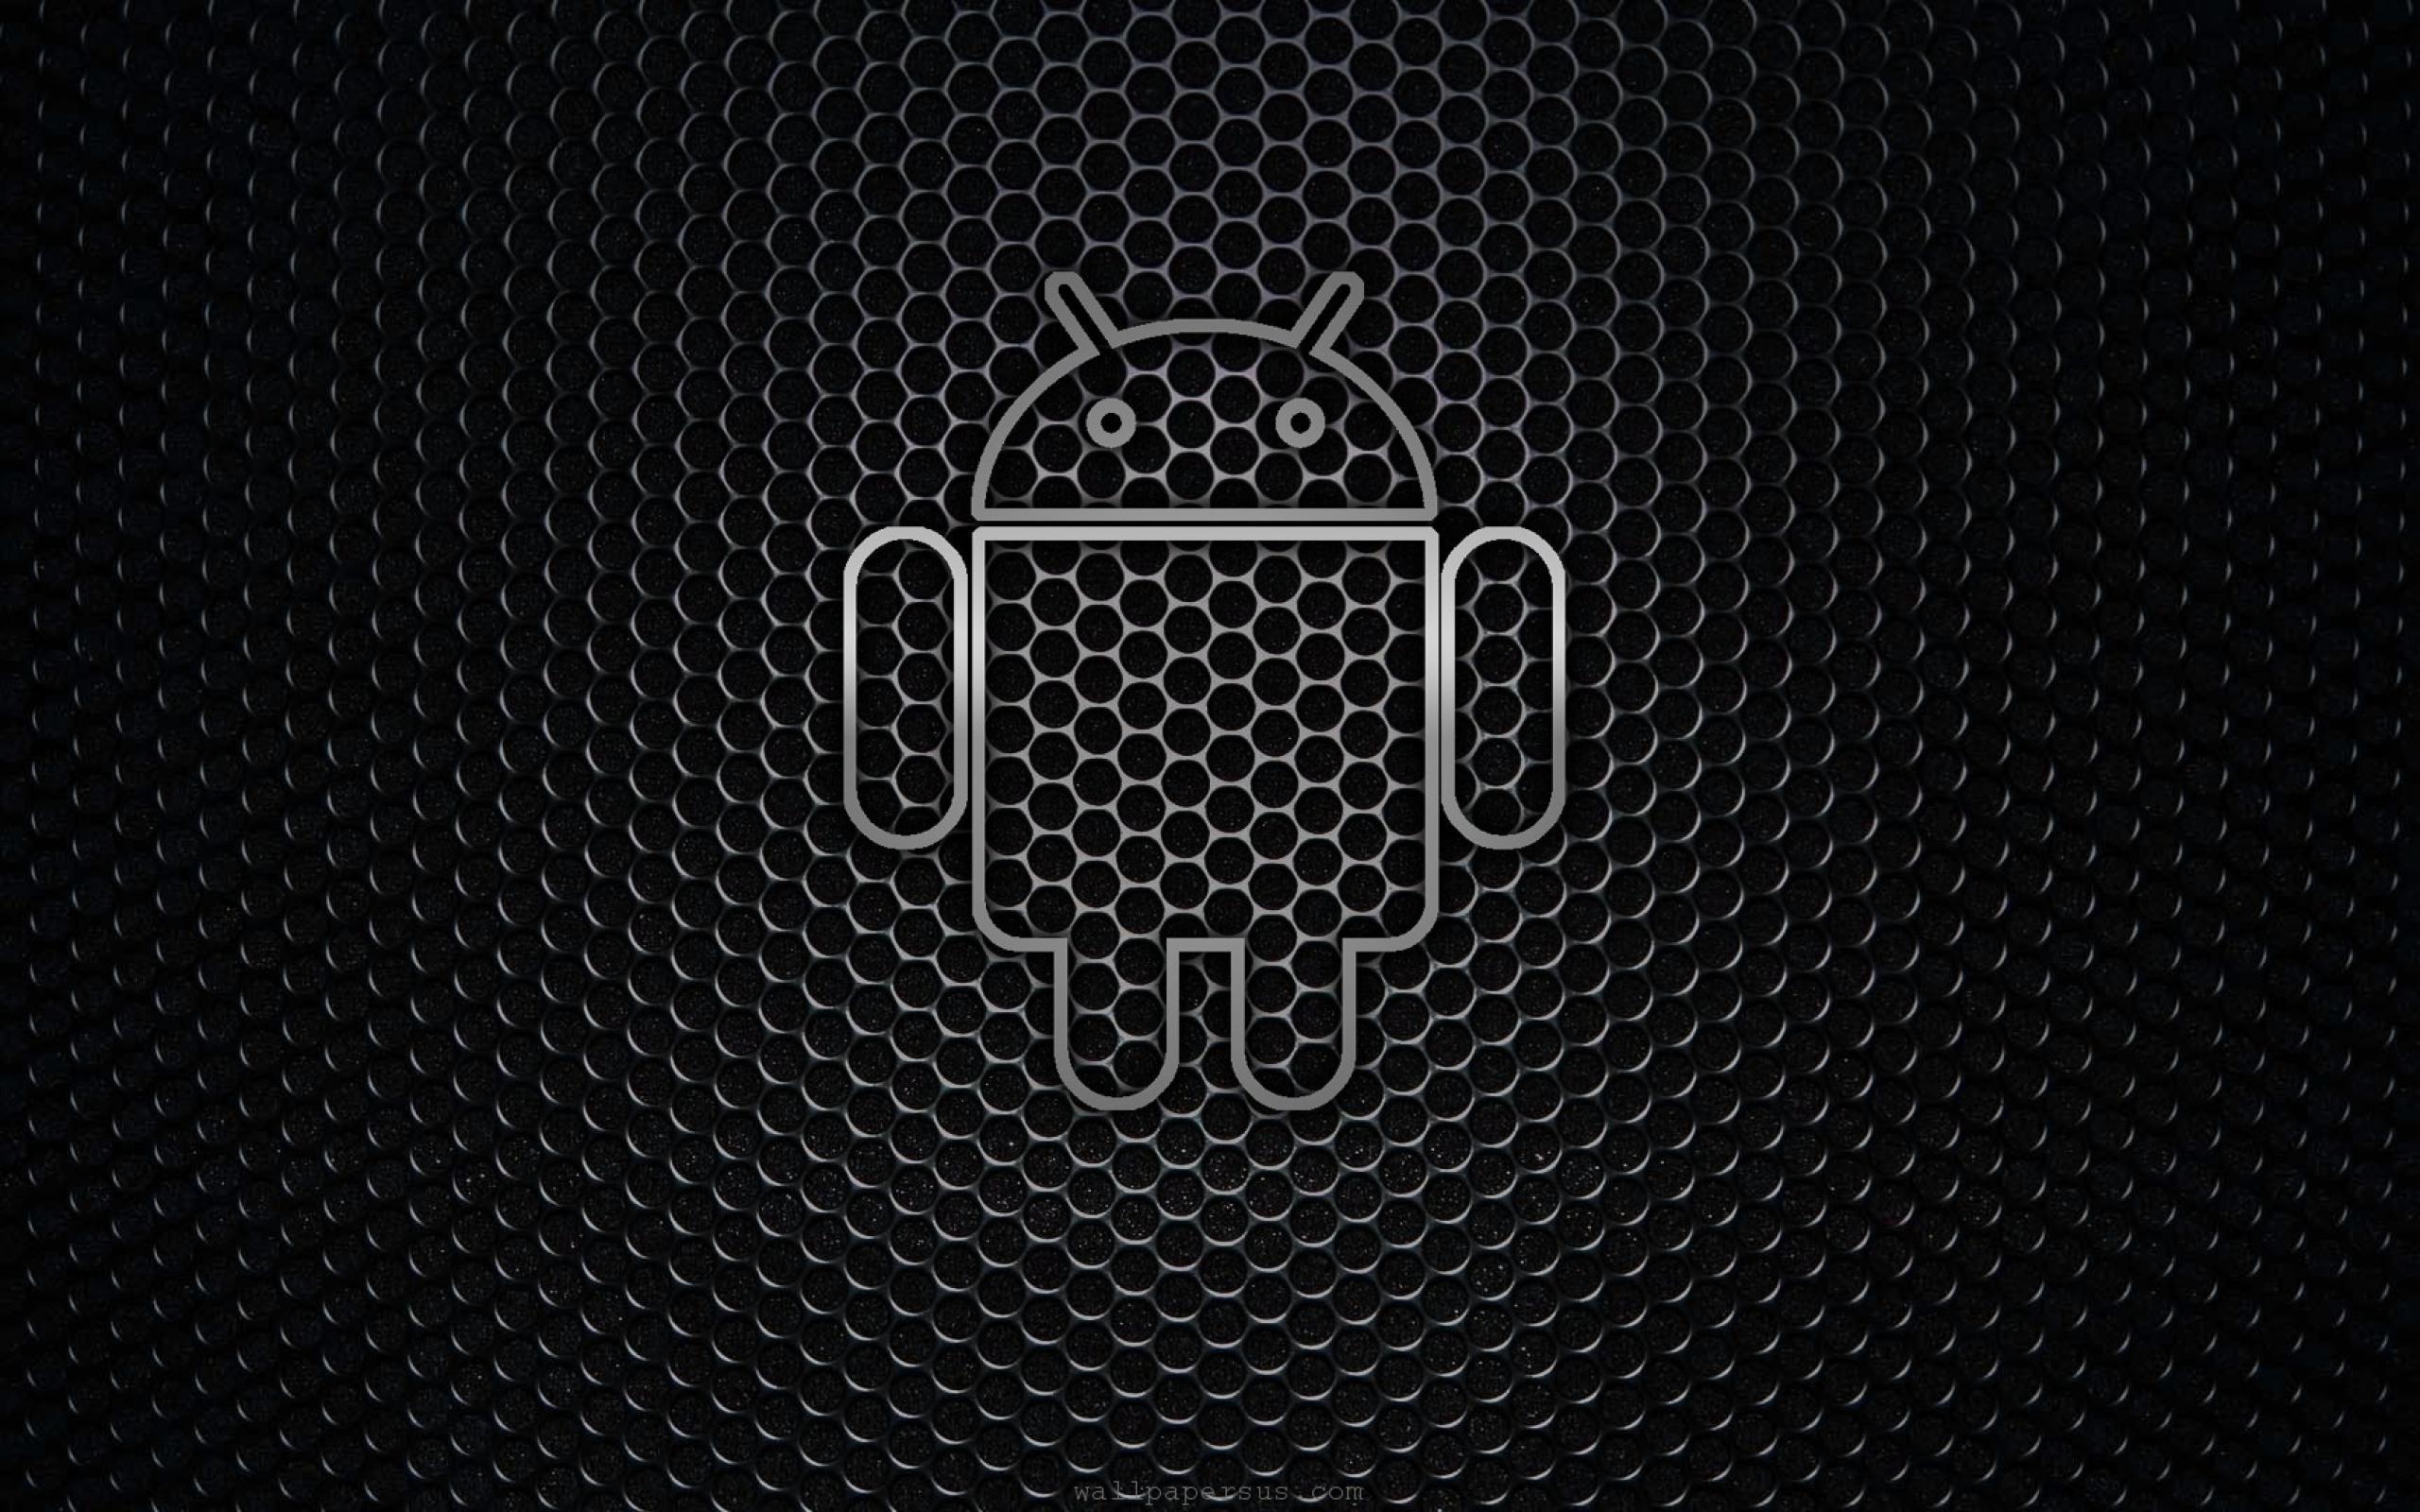 desktop android black logo background wallpaper 2560x1600